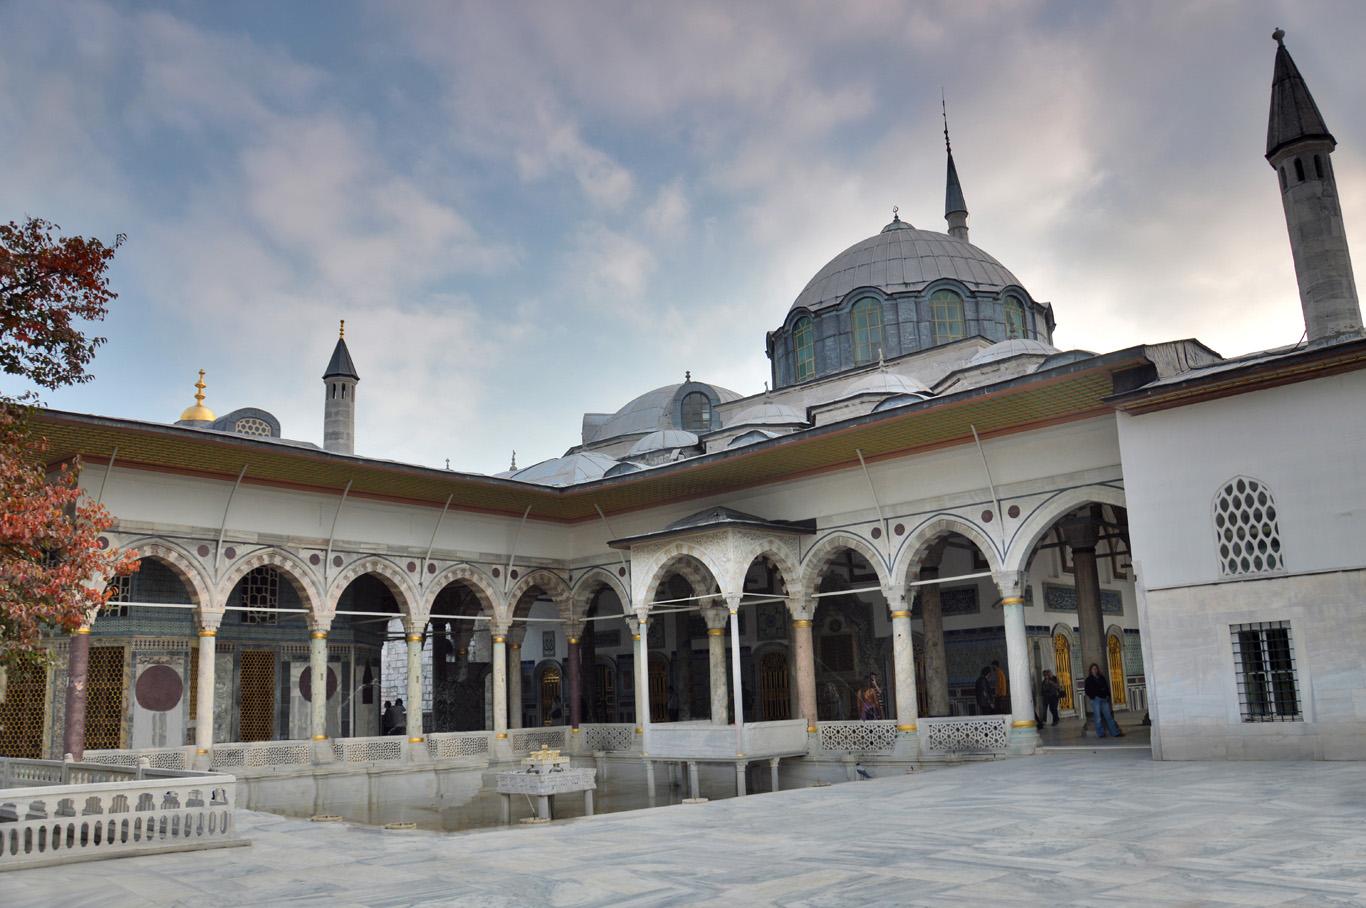 At the Topkapi Palace